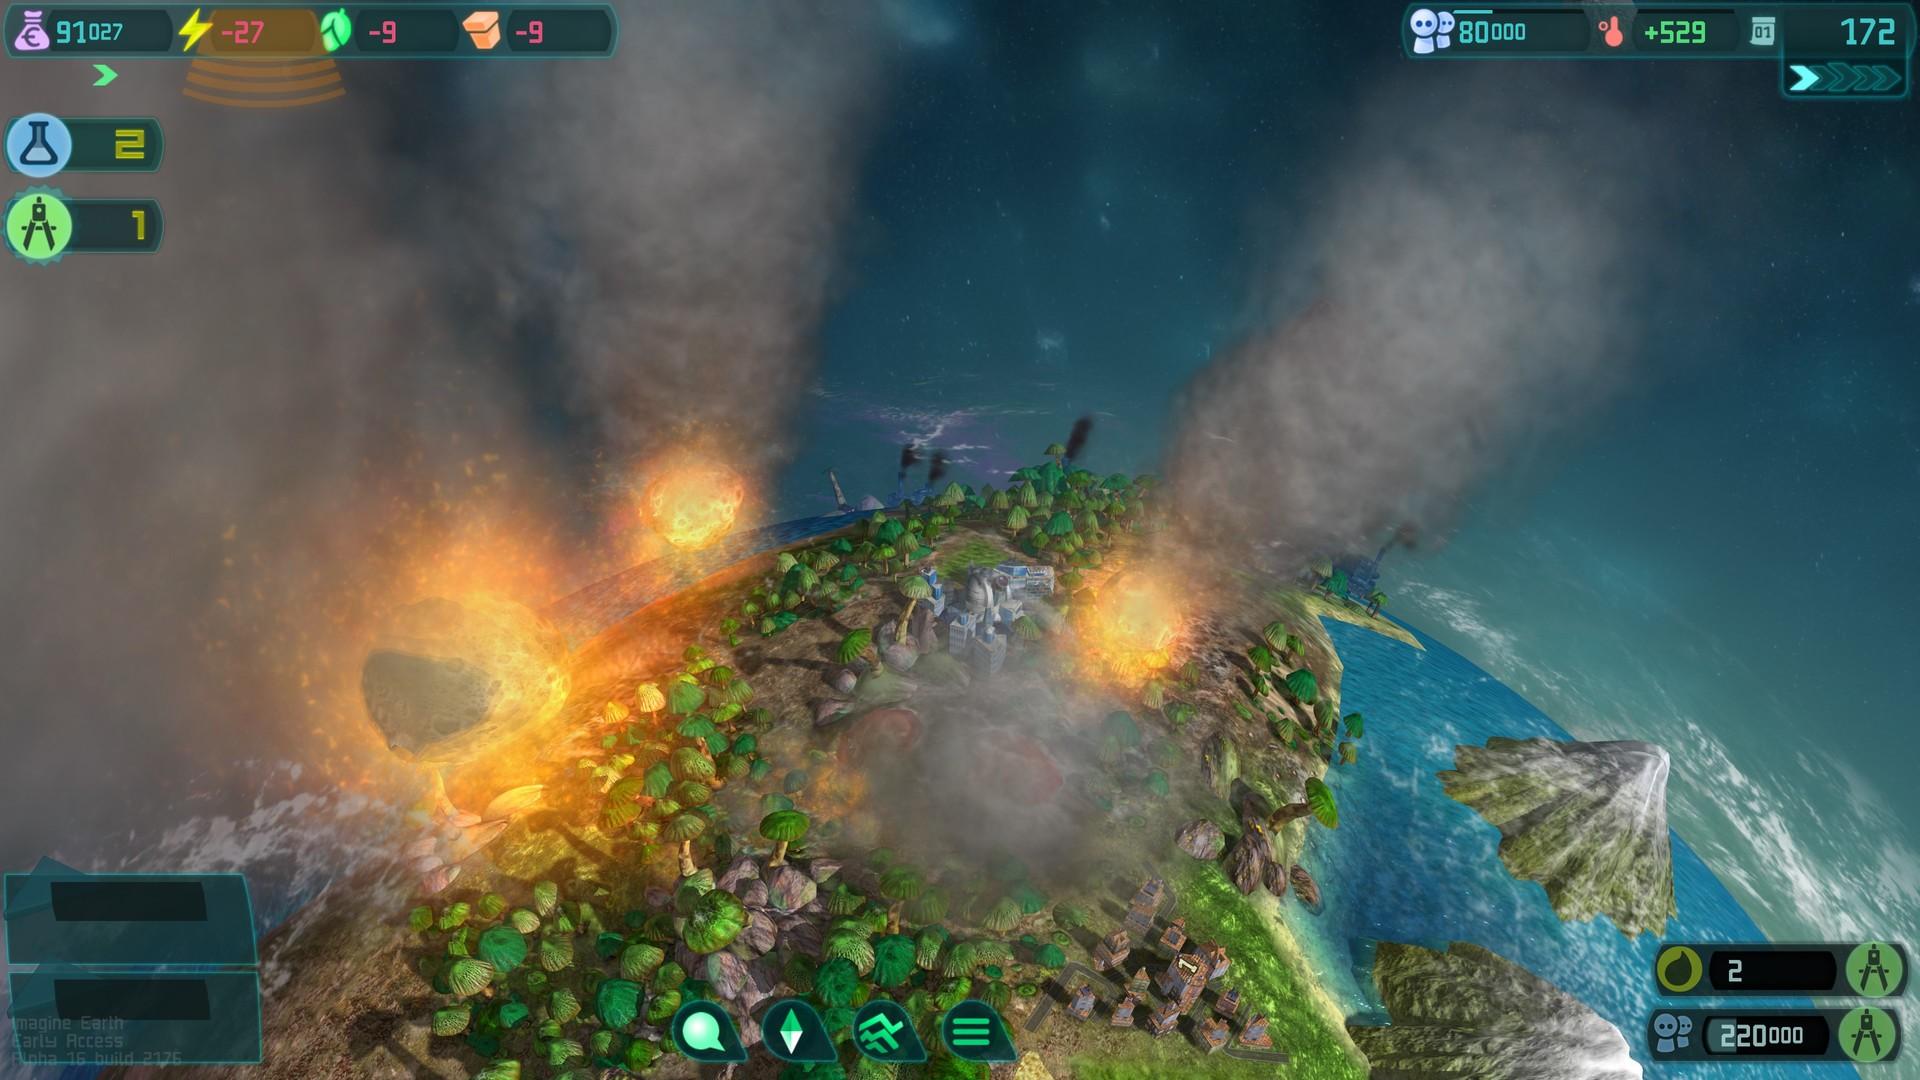 Скриншот игры Imagine Earth Alpha 52.6